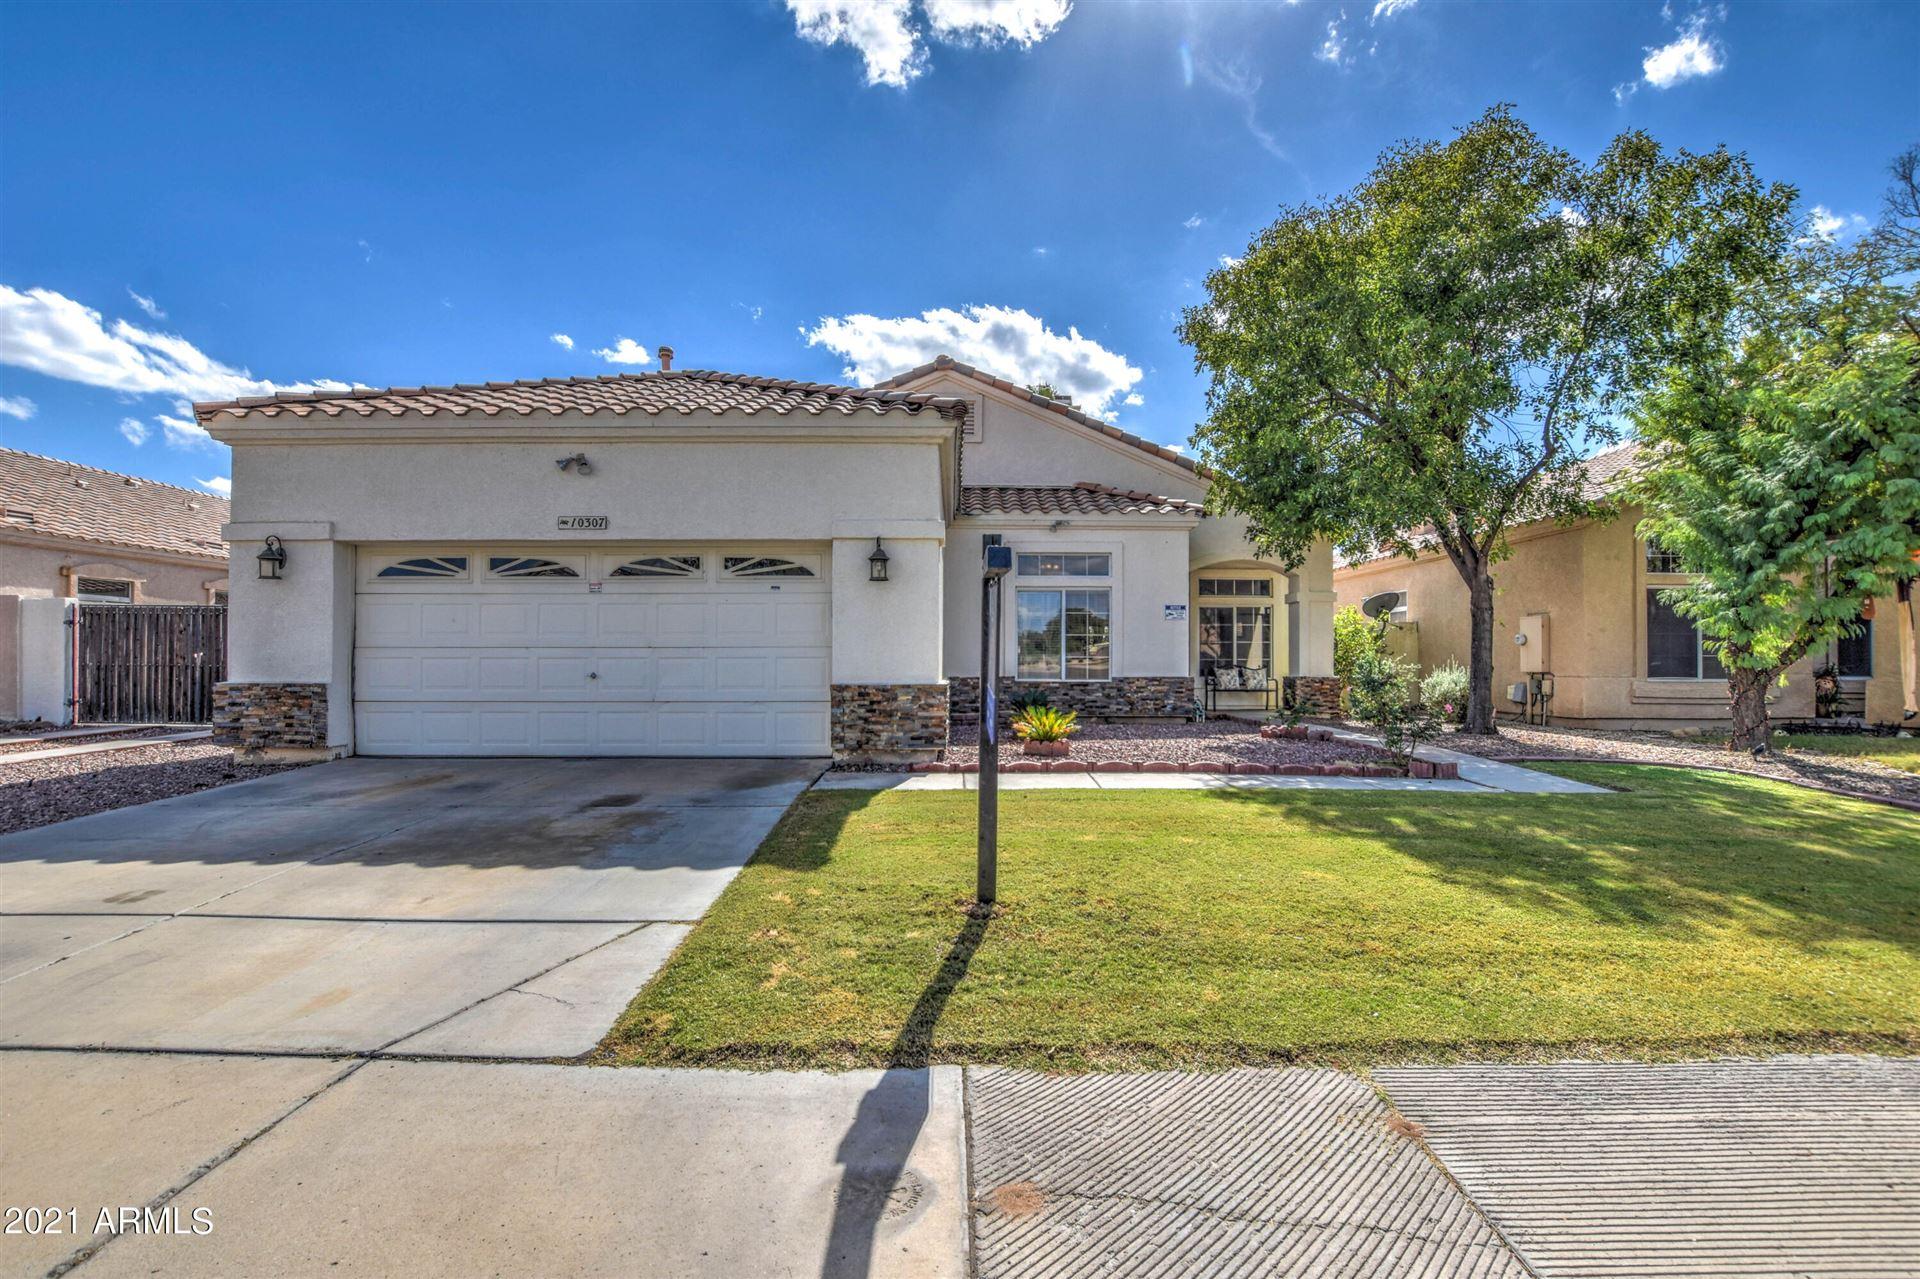 10307 W MONTEBELLO Avenue, Glendale, AZ 85307 - MLS#: 6308310